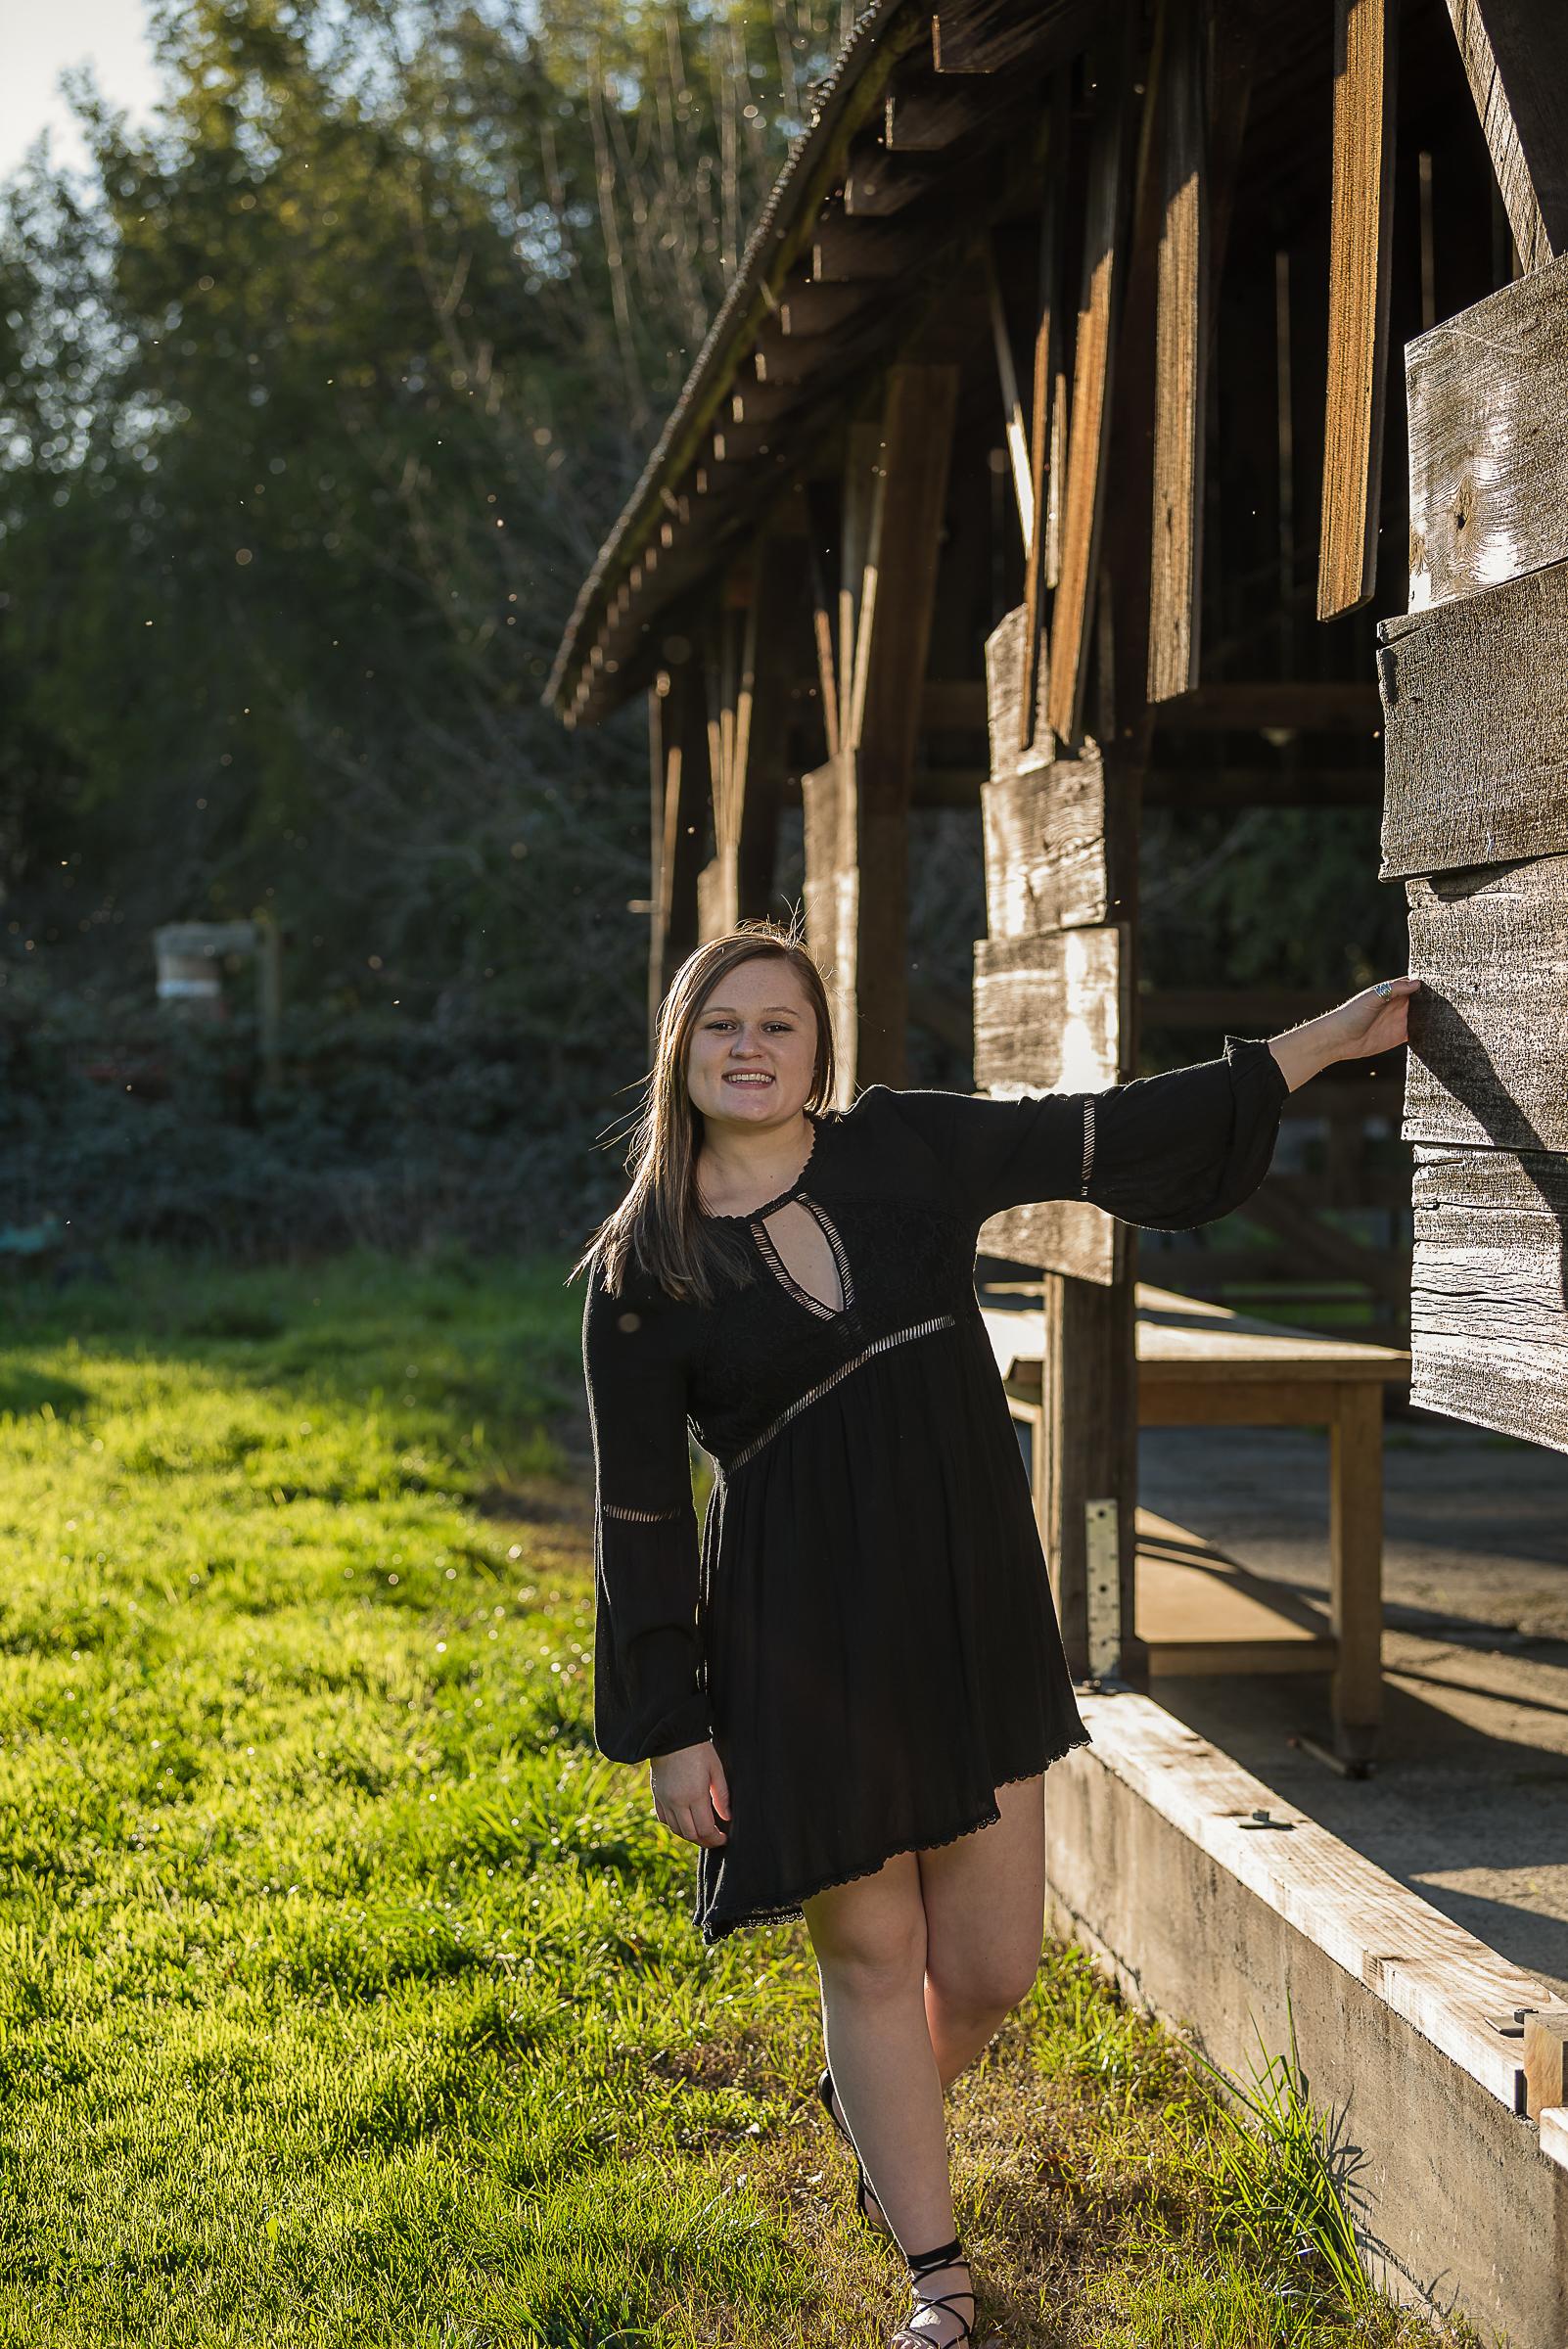 HumboldtCountySeniorPhotographerParky'sPicsBecca-16.JPG